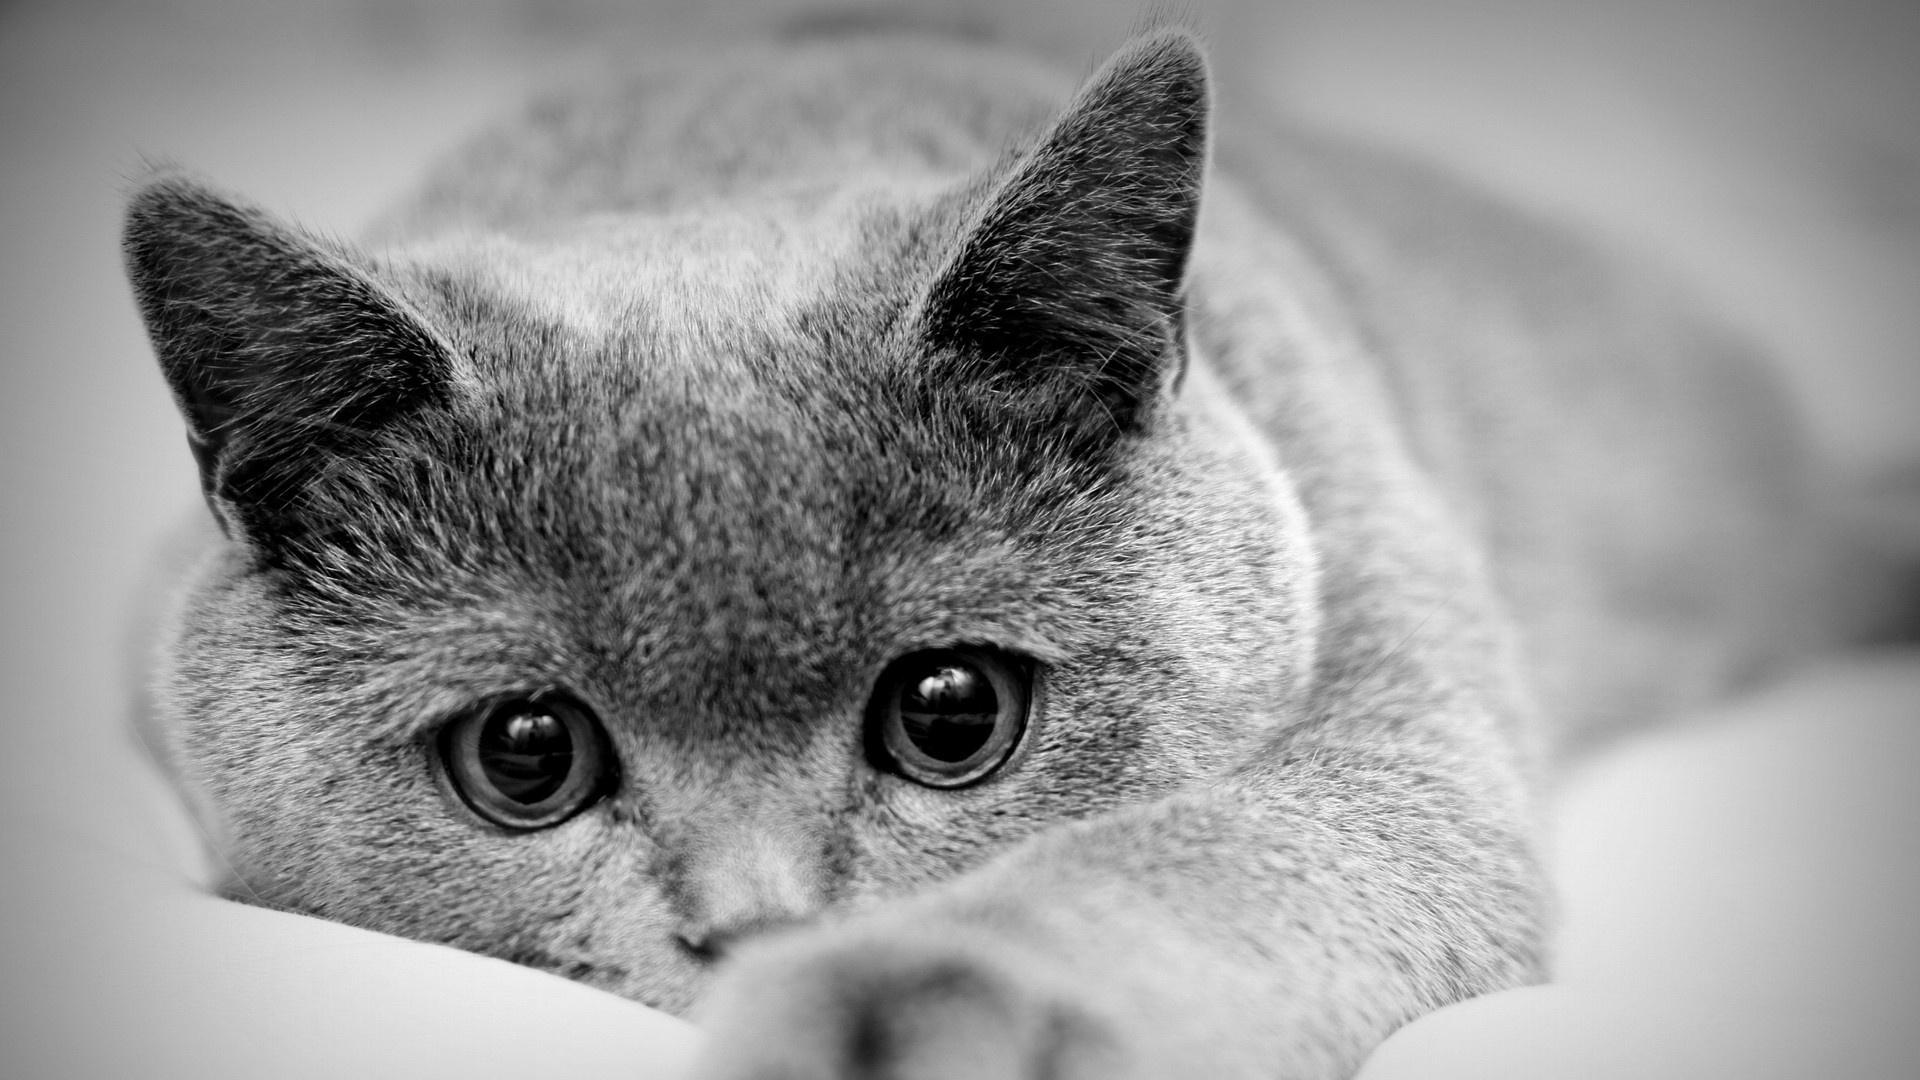 Белые картинки с кошками и надписями, марта кошка